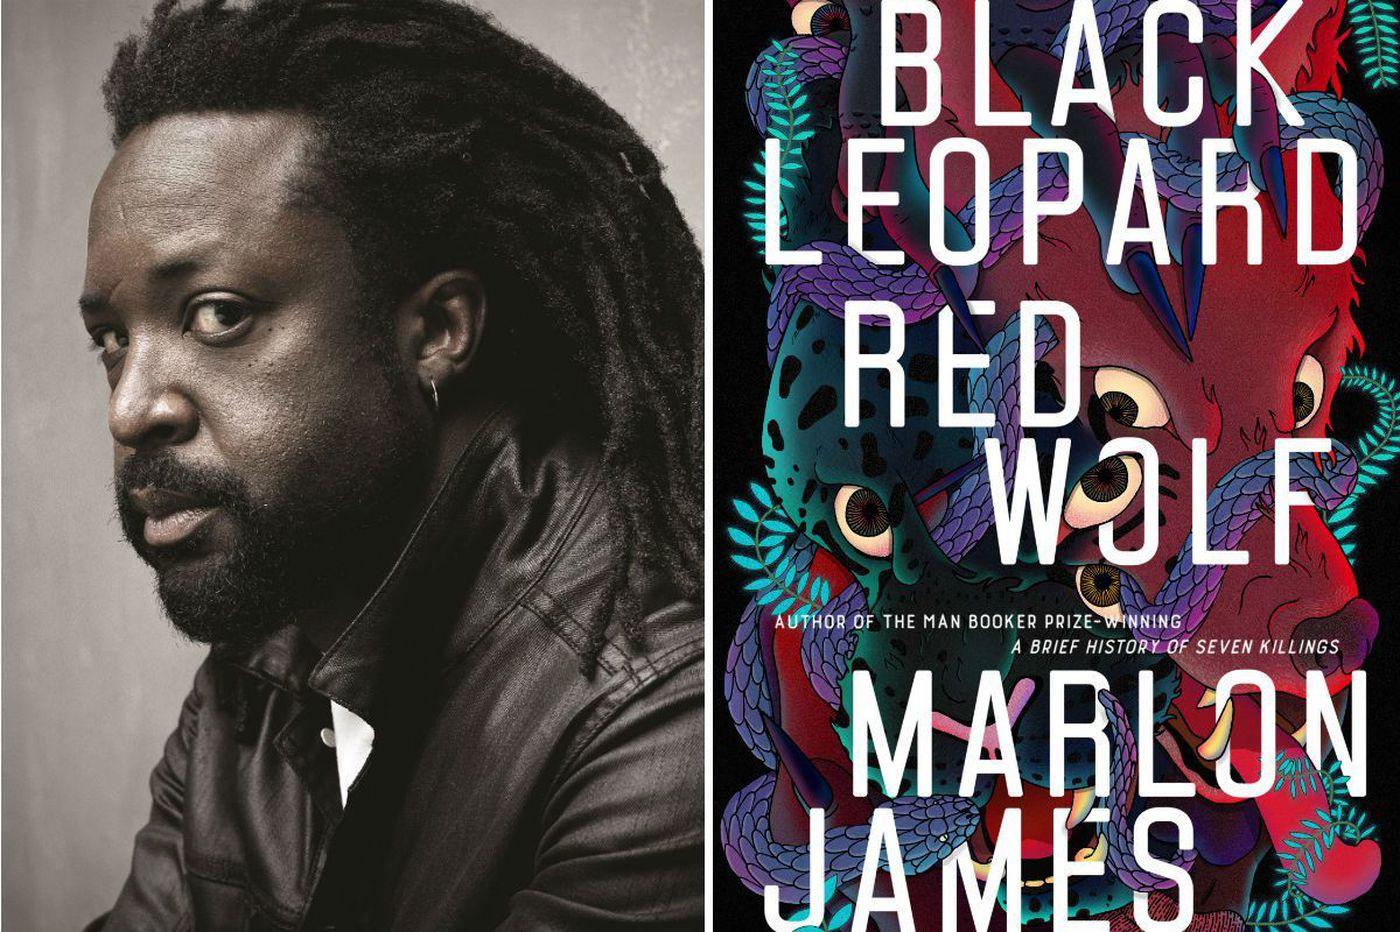 Marlon James' 'Black Leopard': The novel that rewrites the fantasy playbook